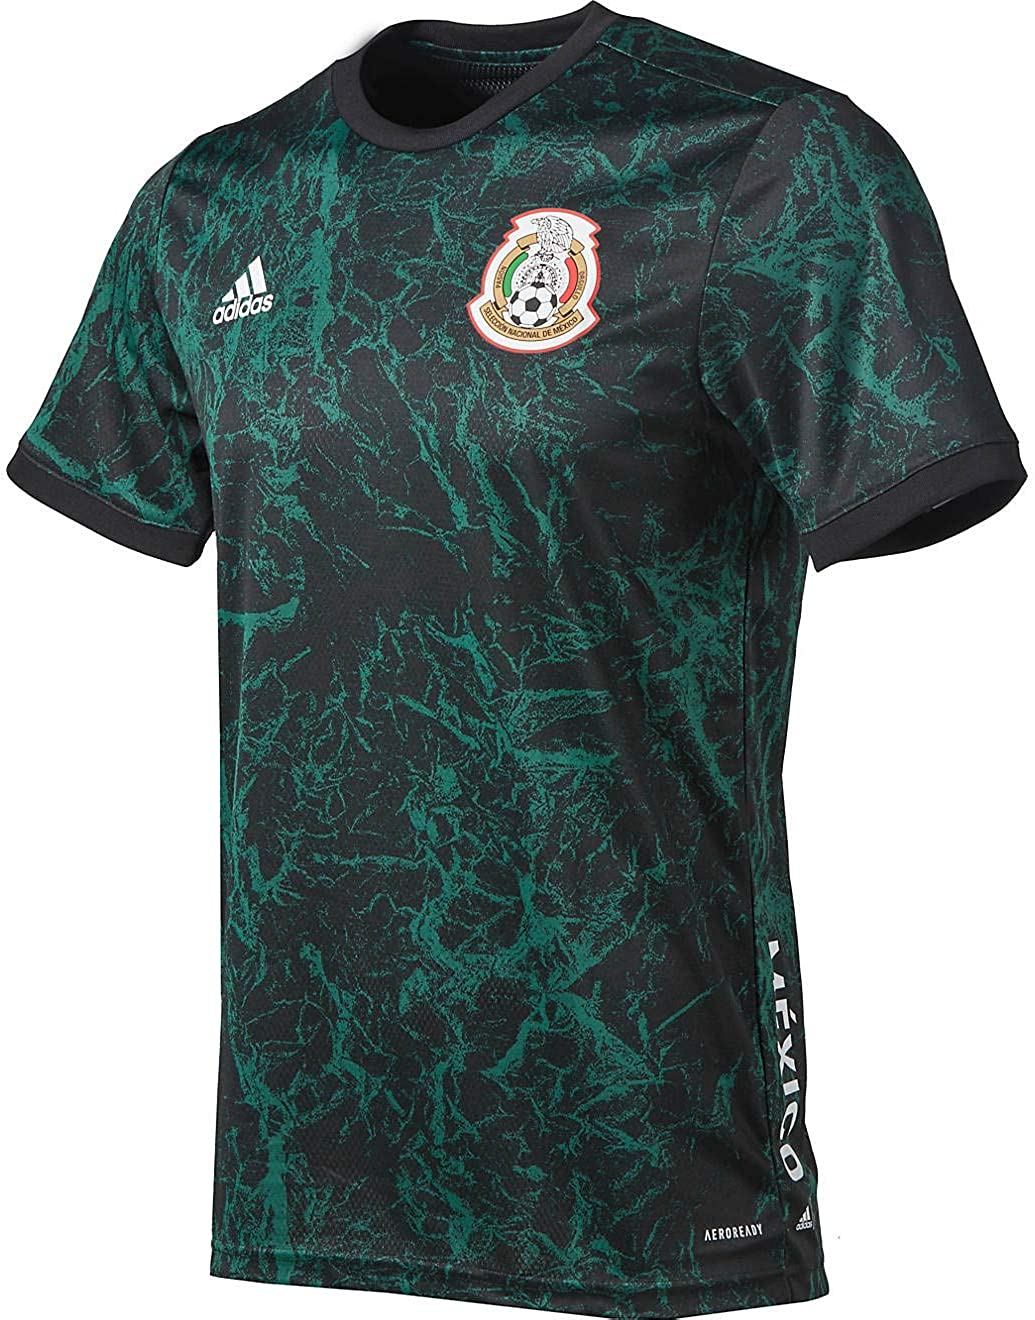 adidas Men's 2020-21 Mexico Home Pre-Match Jersey